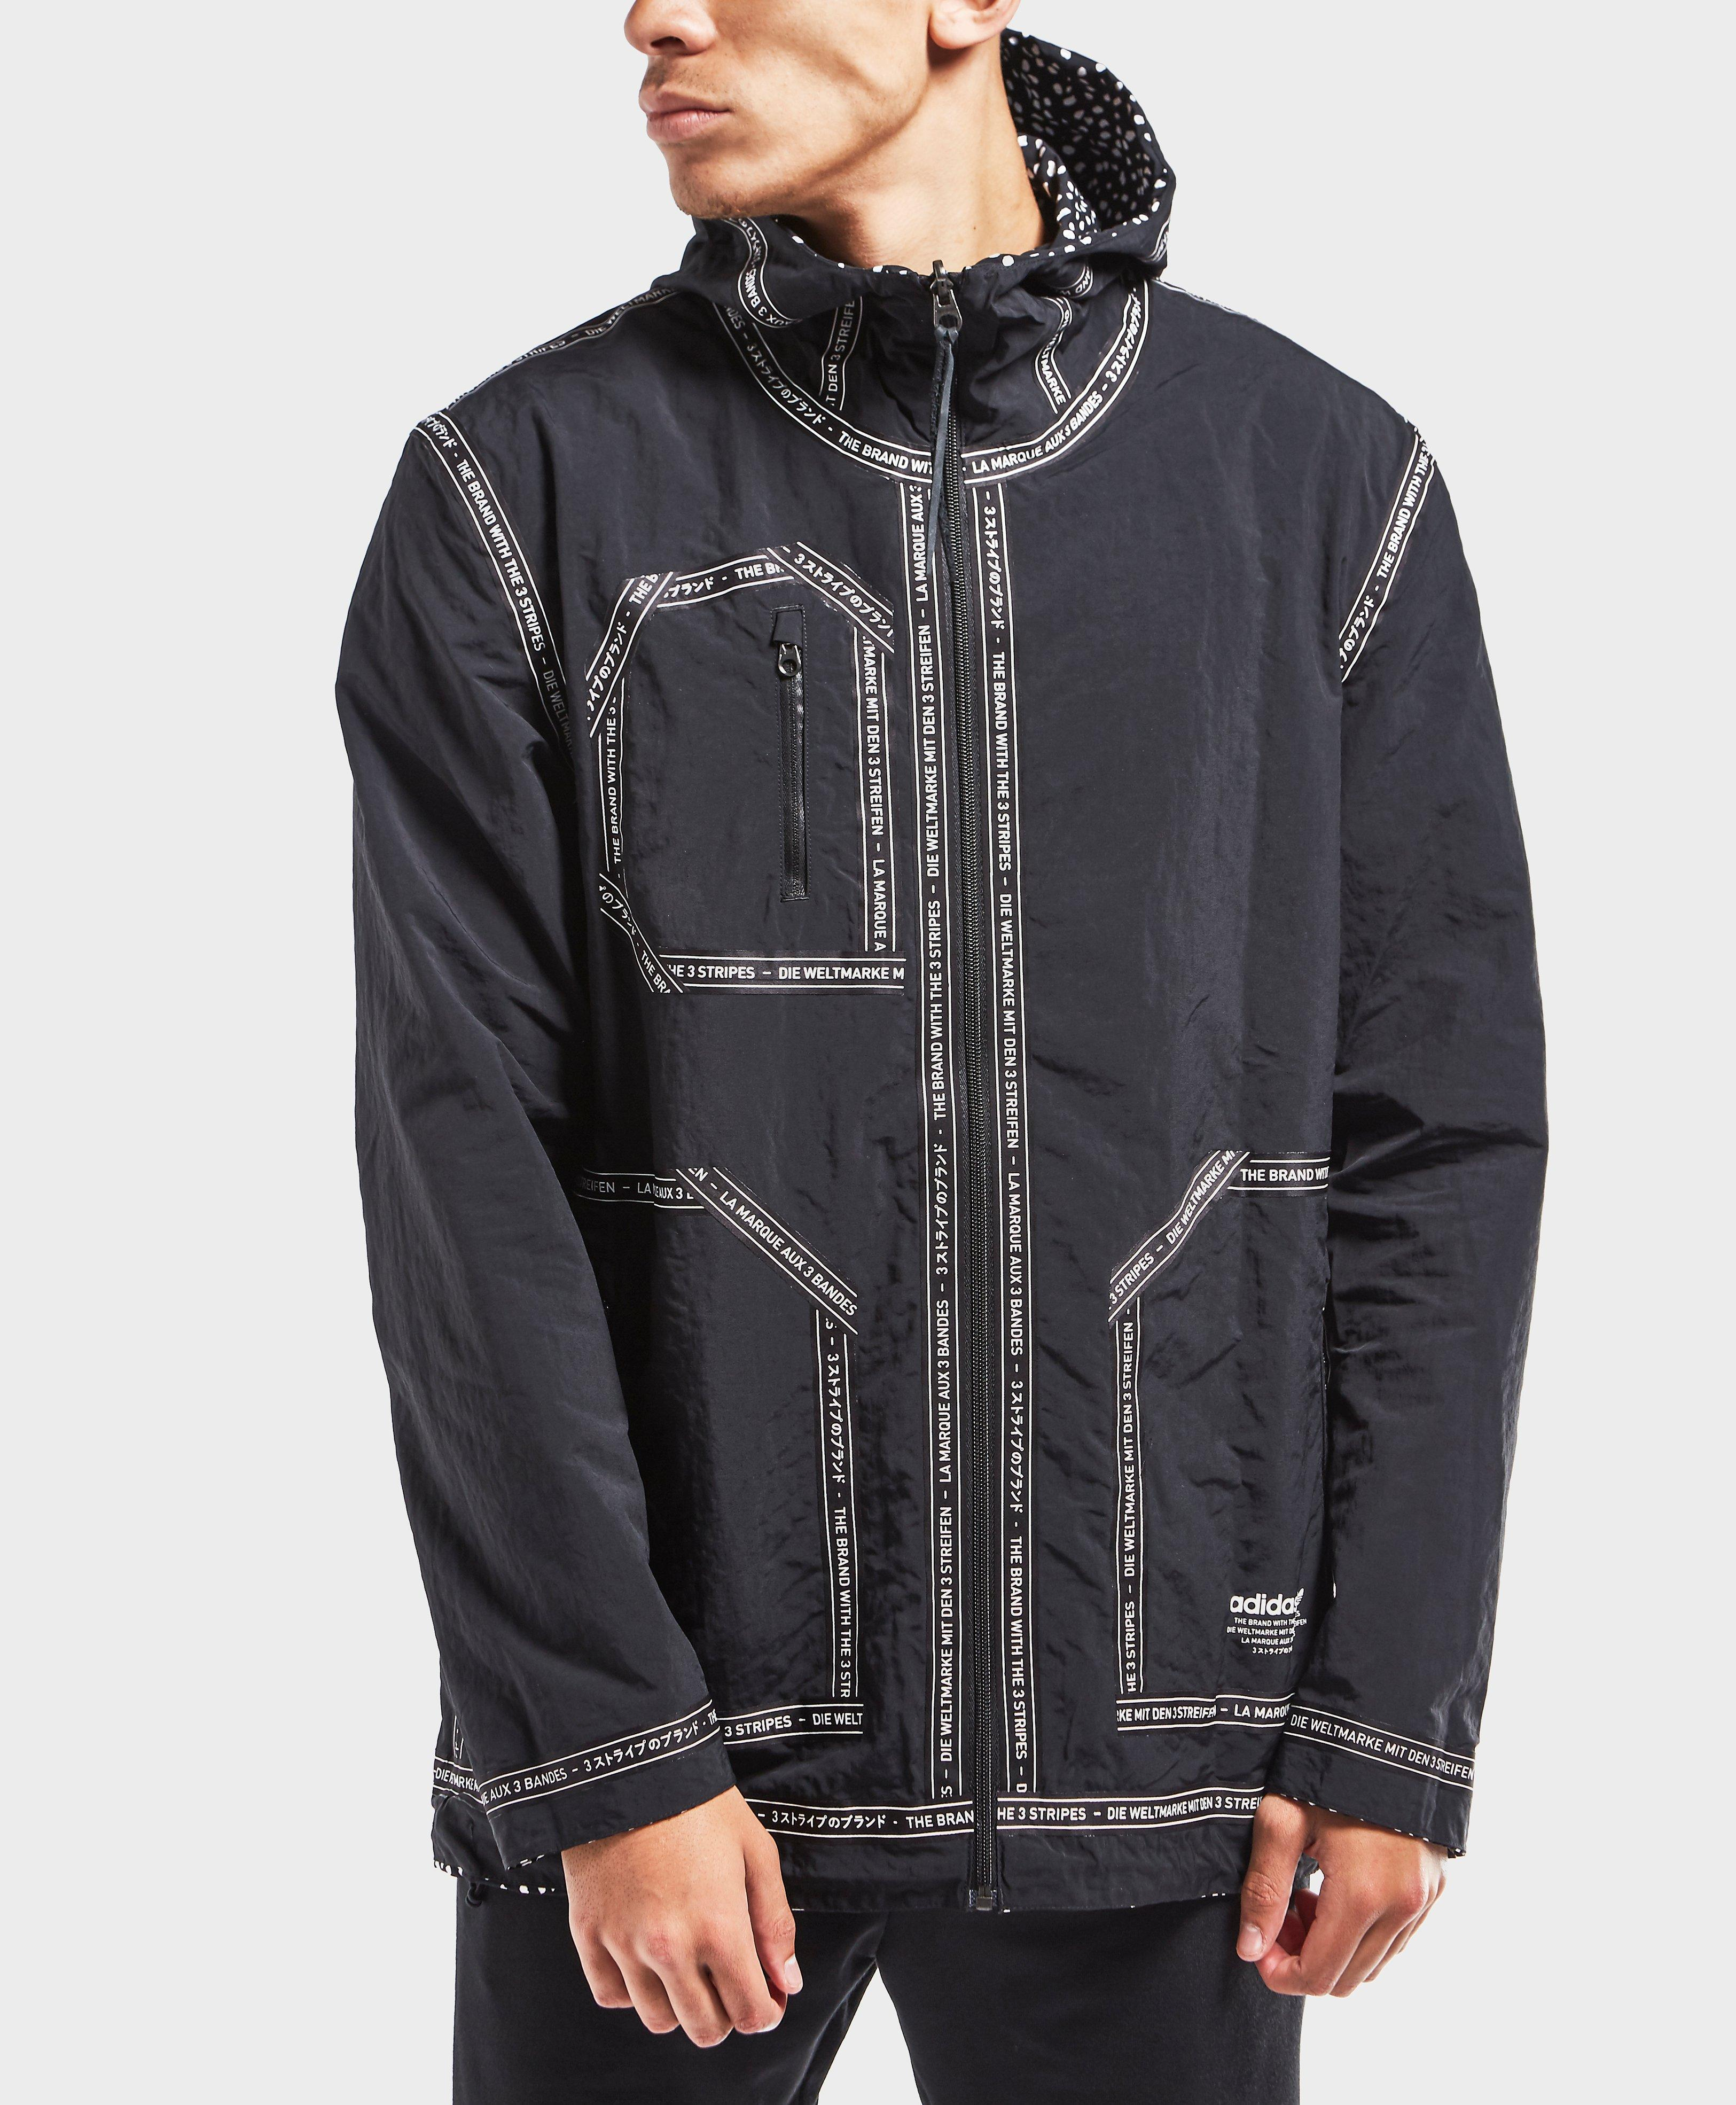 adidas Originals Nmd Reversible Field Jacket for Men